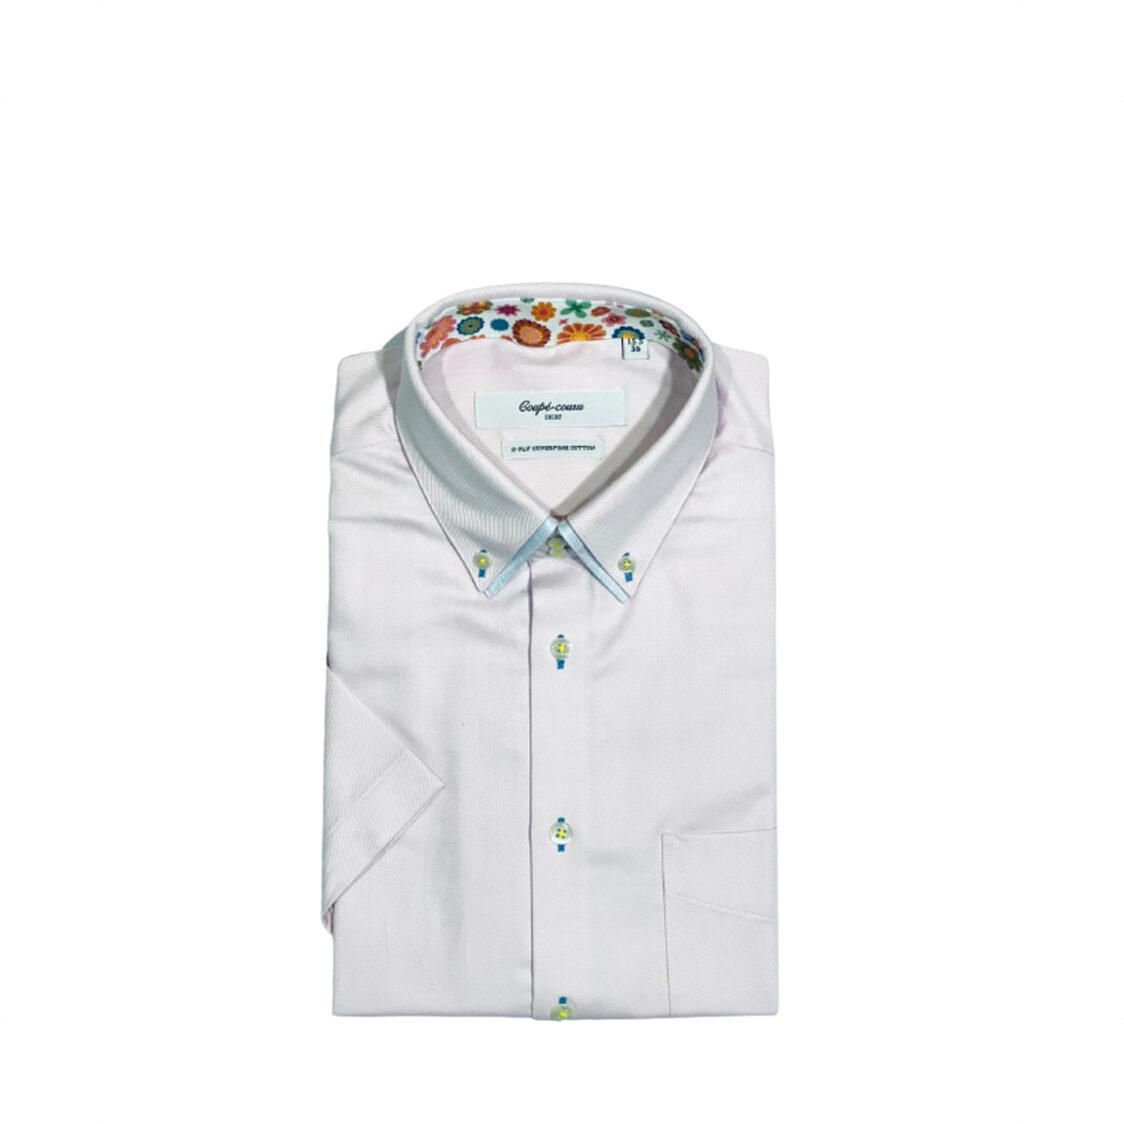 Coupe Cousu Double Collar Short Sleeve Shirt Light Pink